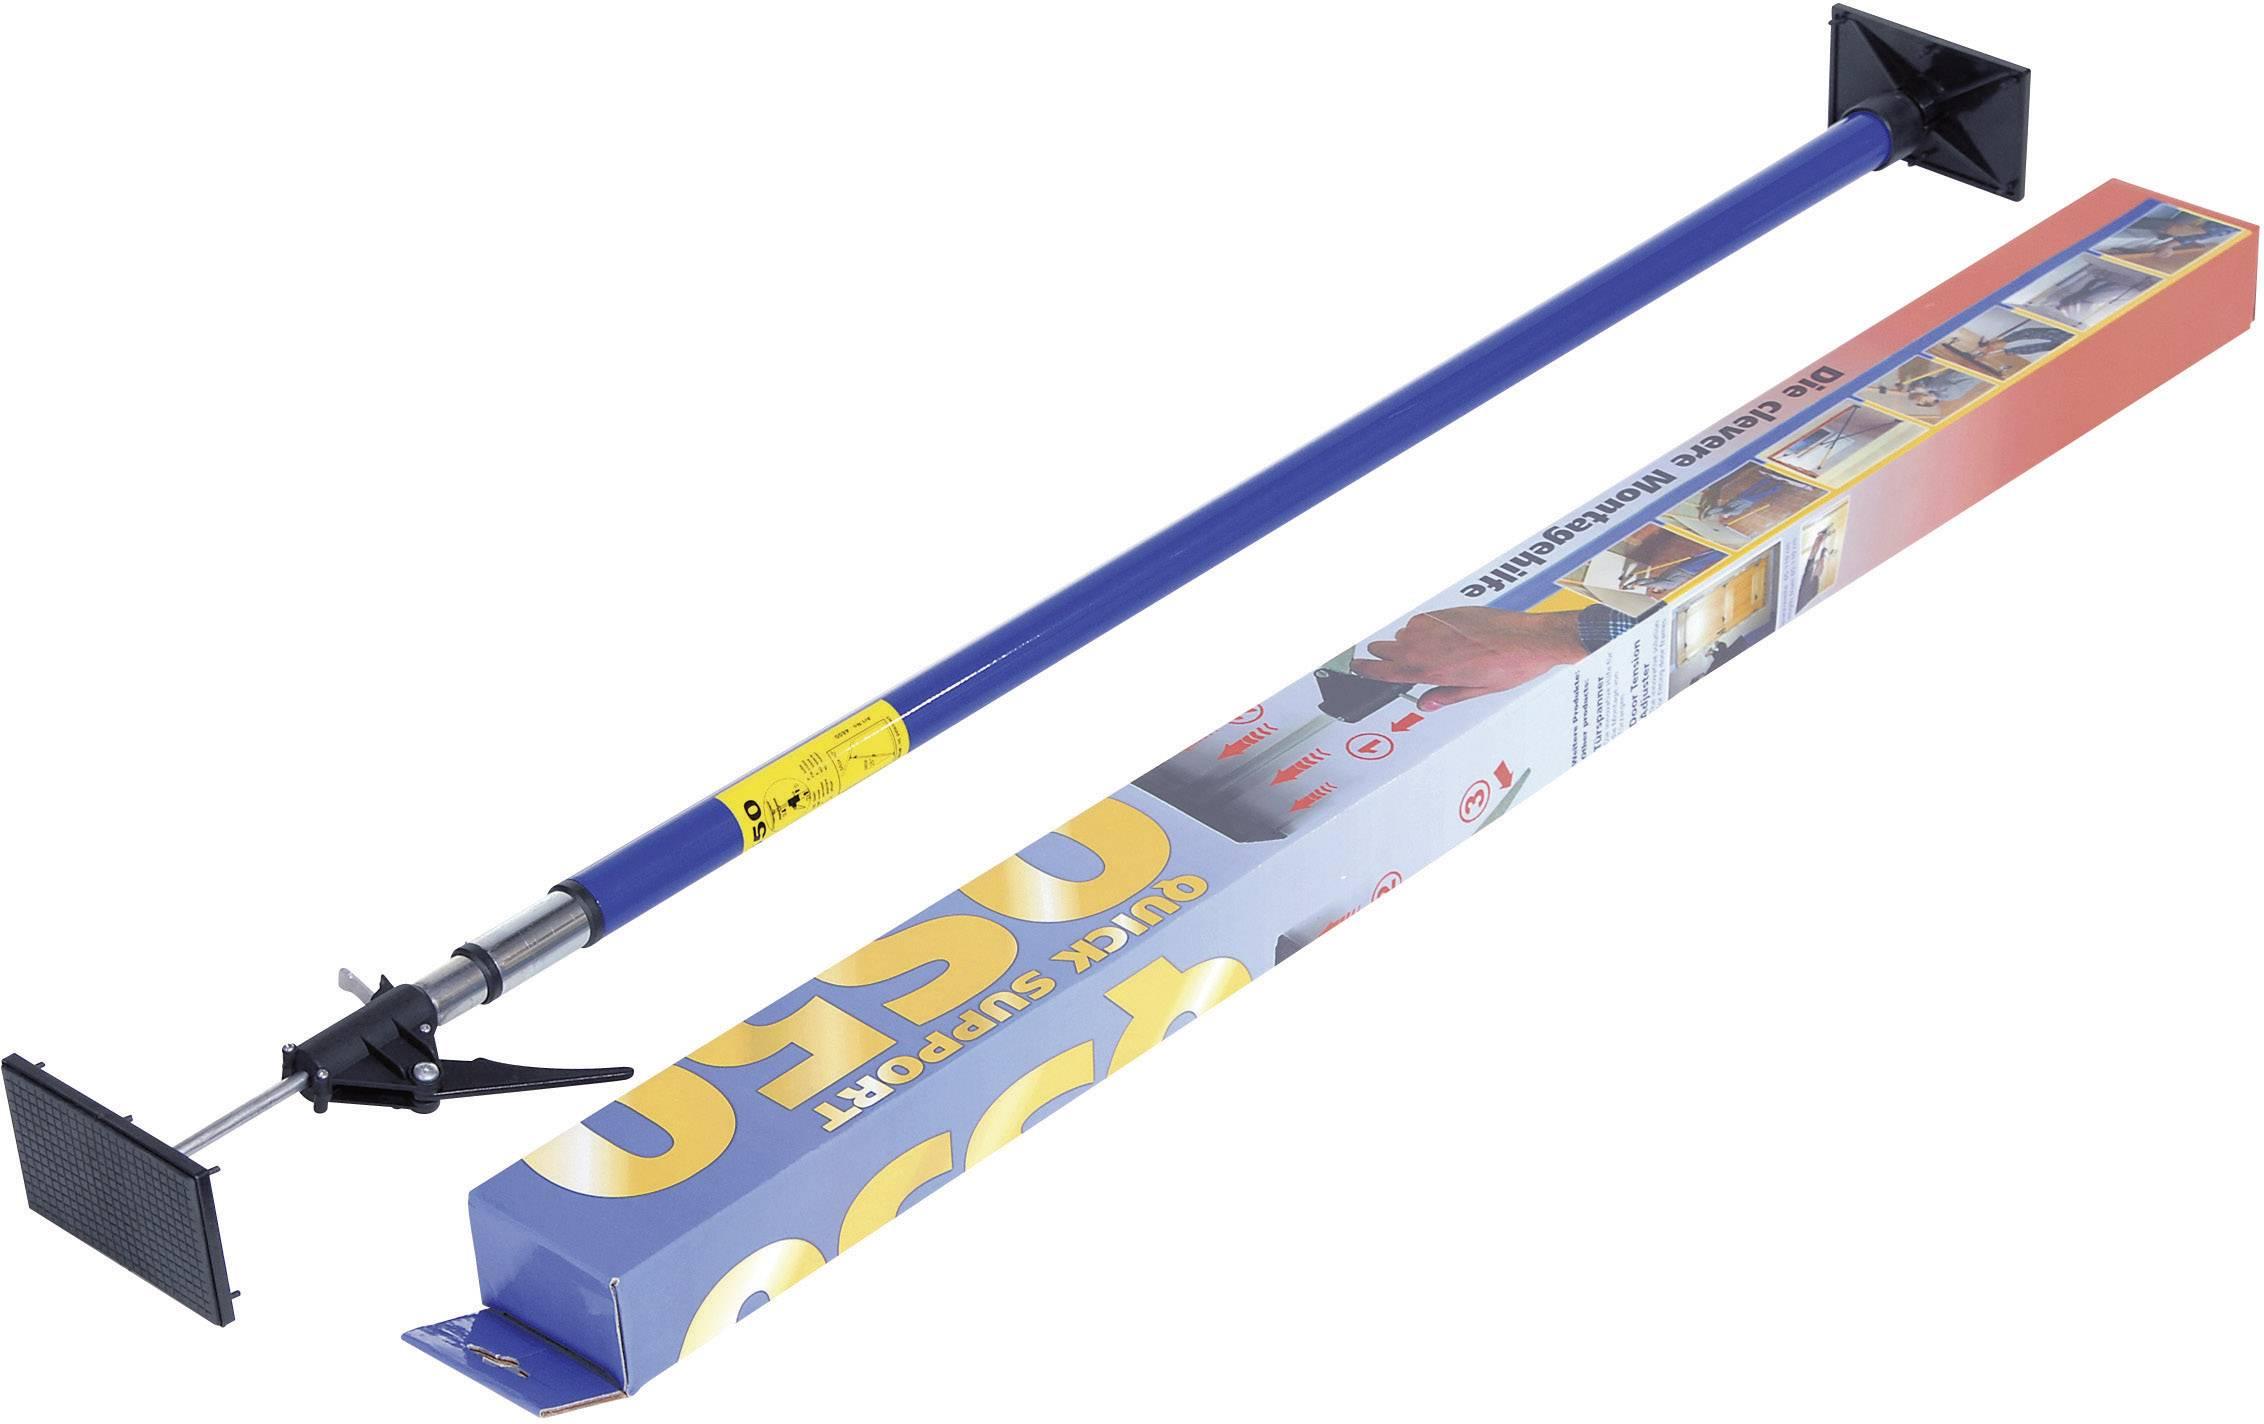 Teleskopická podperná tyč QS50 824183, 1.15 - 3.08 m, Max.nosnosť: 50 kg